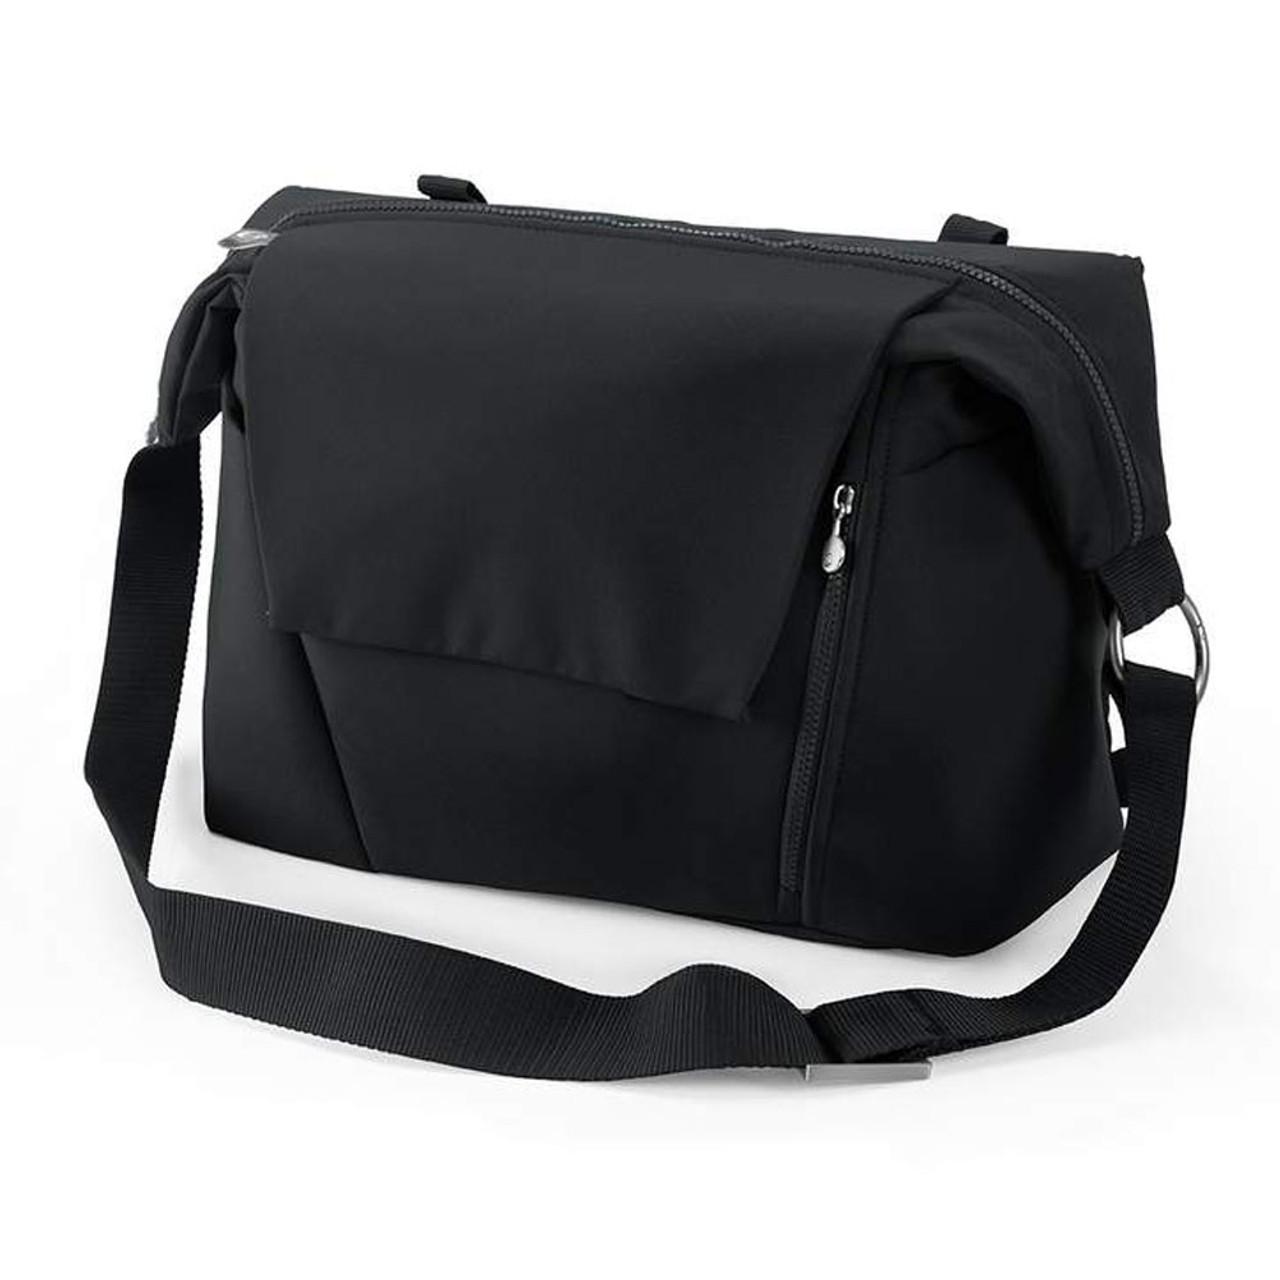 2f7ffd121a80d Stokke Changing Bag - Black - Dear-Born Baby